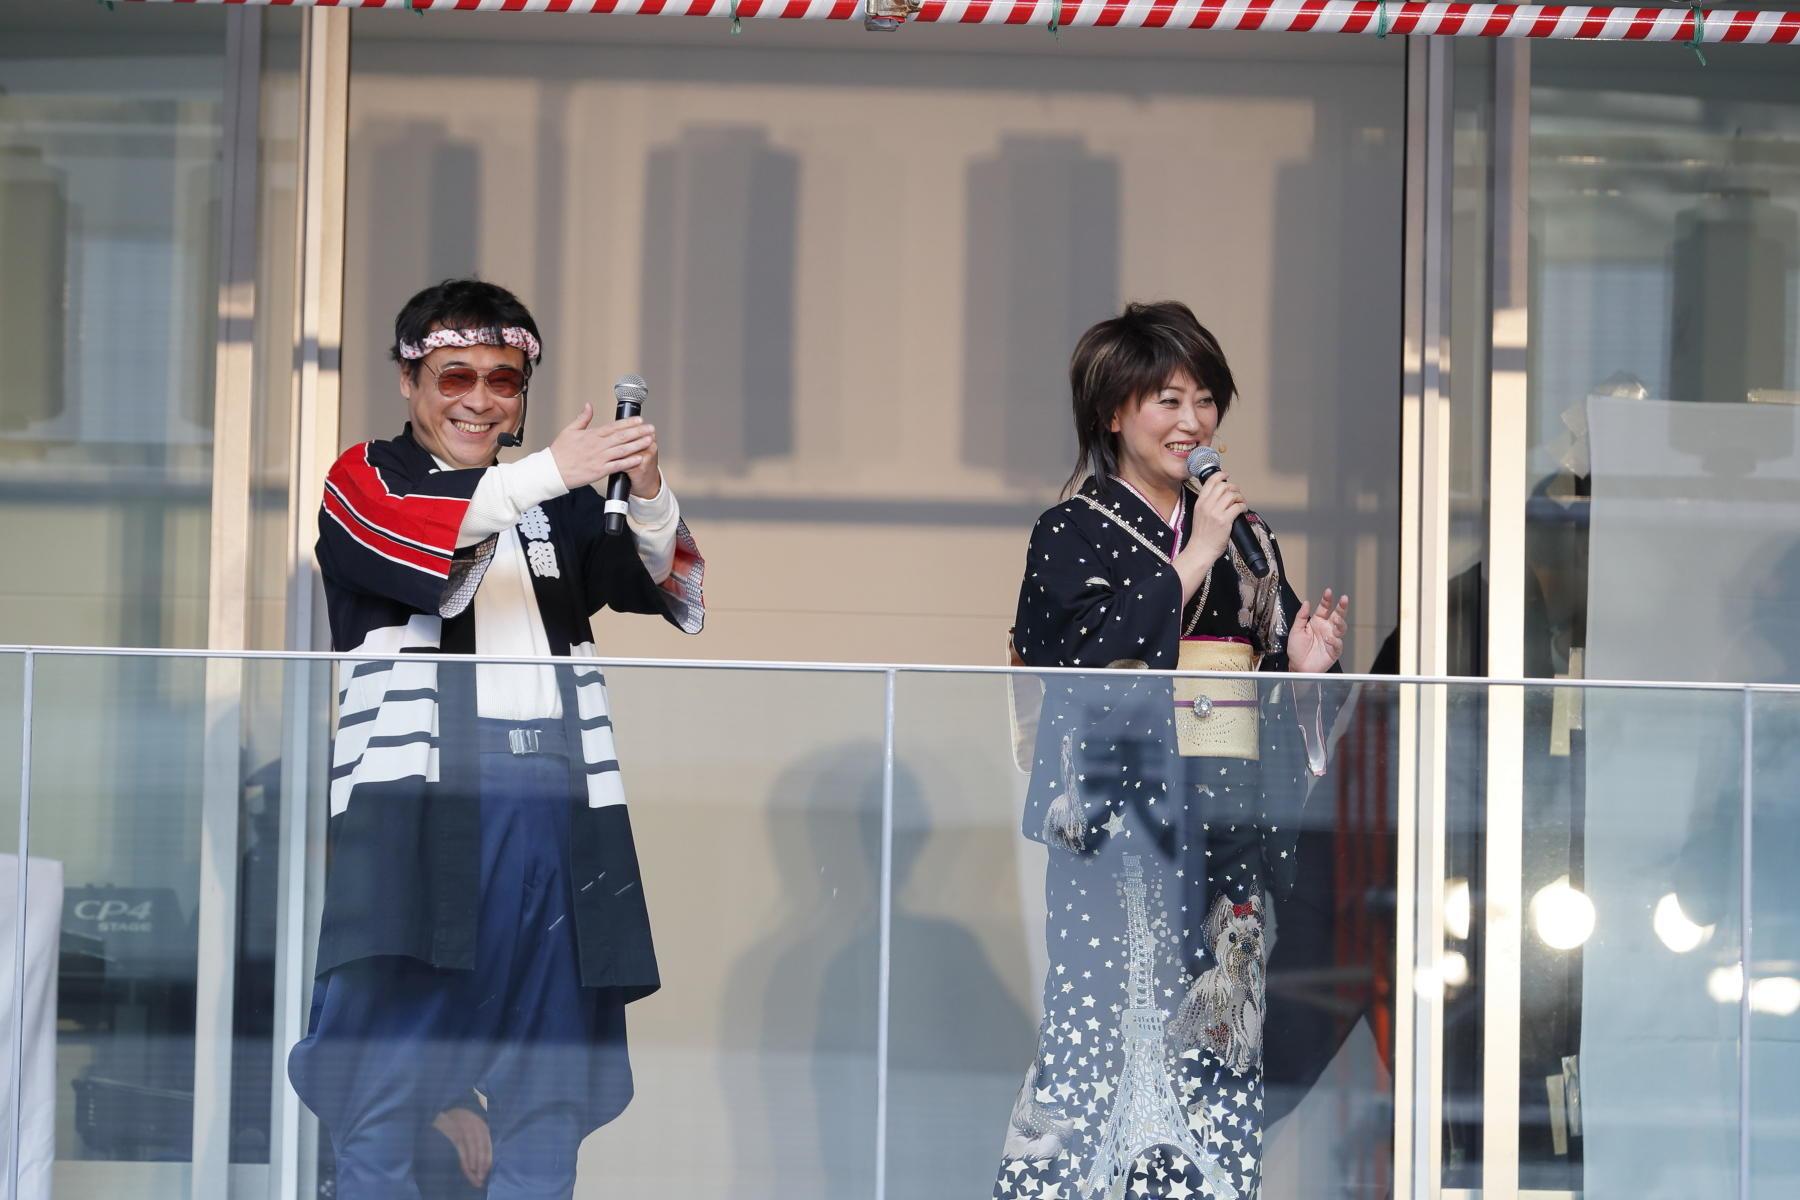 http://news.yoshimoto.co.jp/20190203205123-379a947e82f36638039dc3c7f28455666a7b5e75.jpg